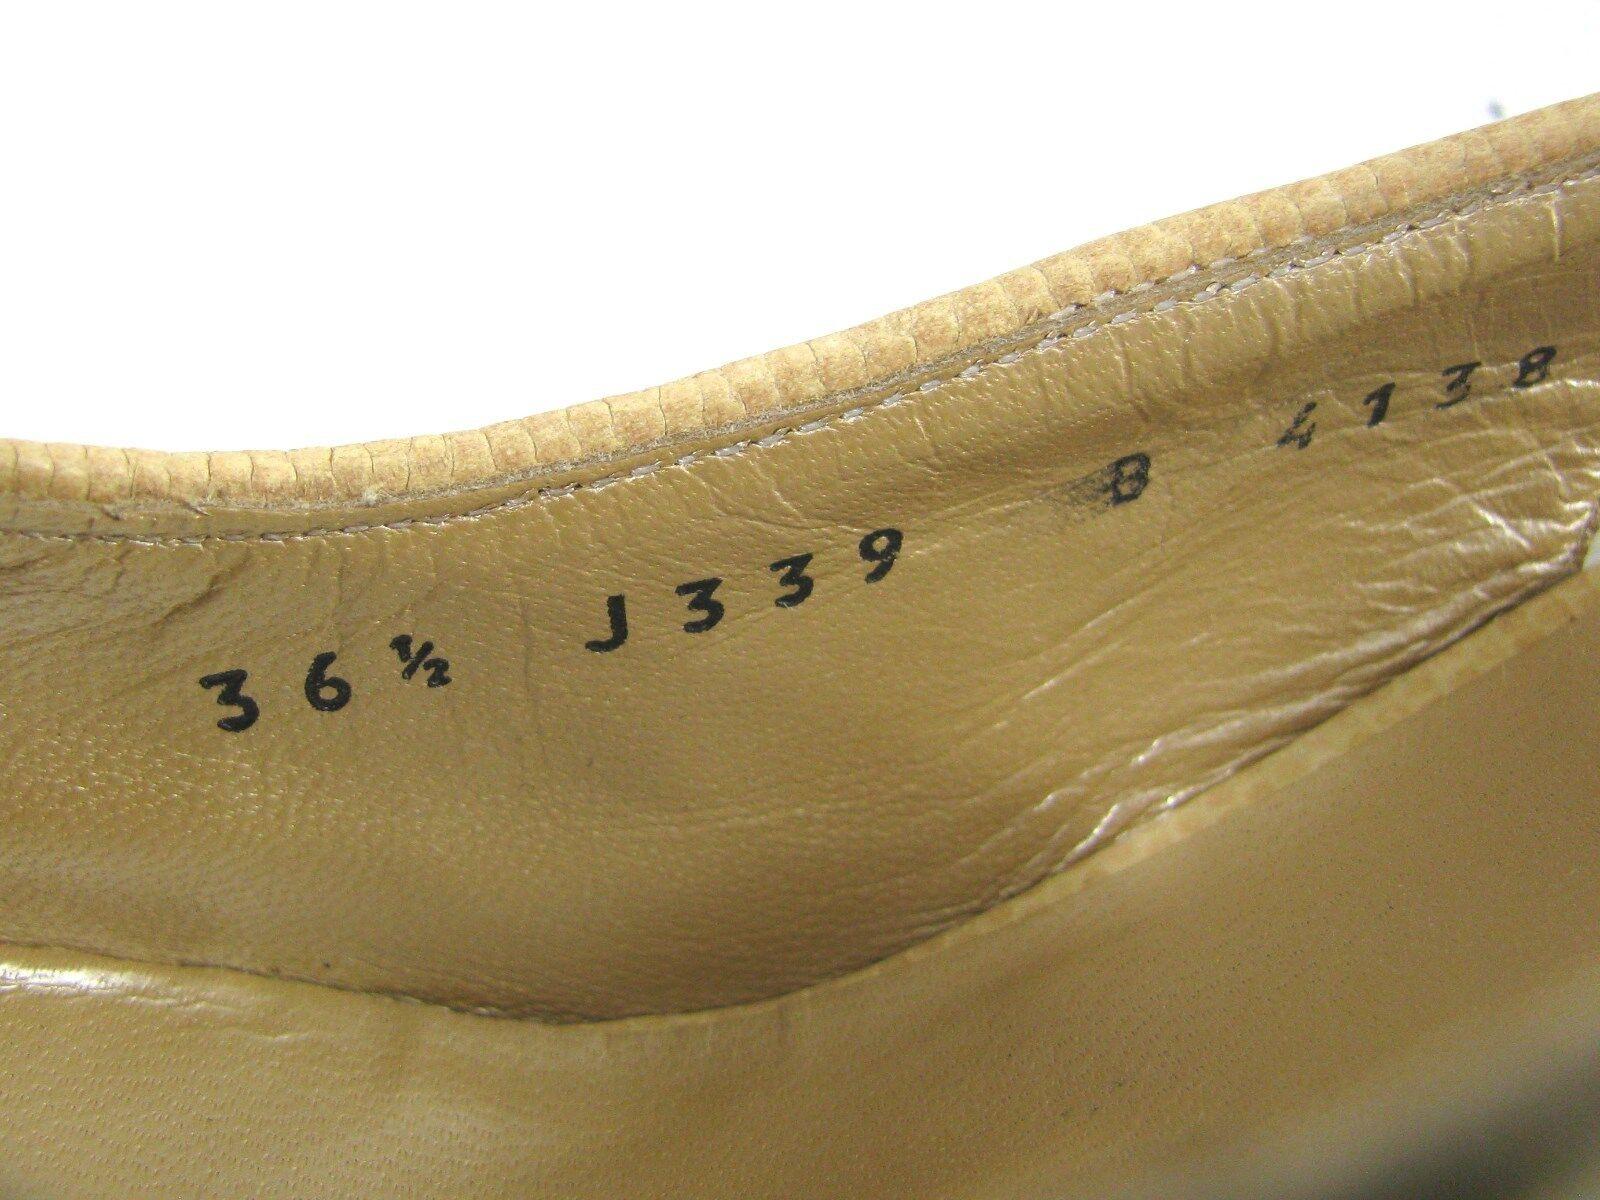 New ST JOHN Raffia Heels Heels Heels 6.5 B  Multi color Beige Slingback shoes  Pump b19d44